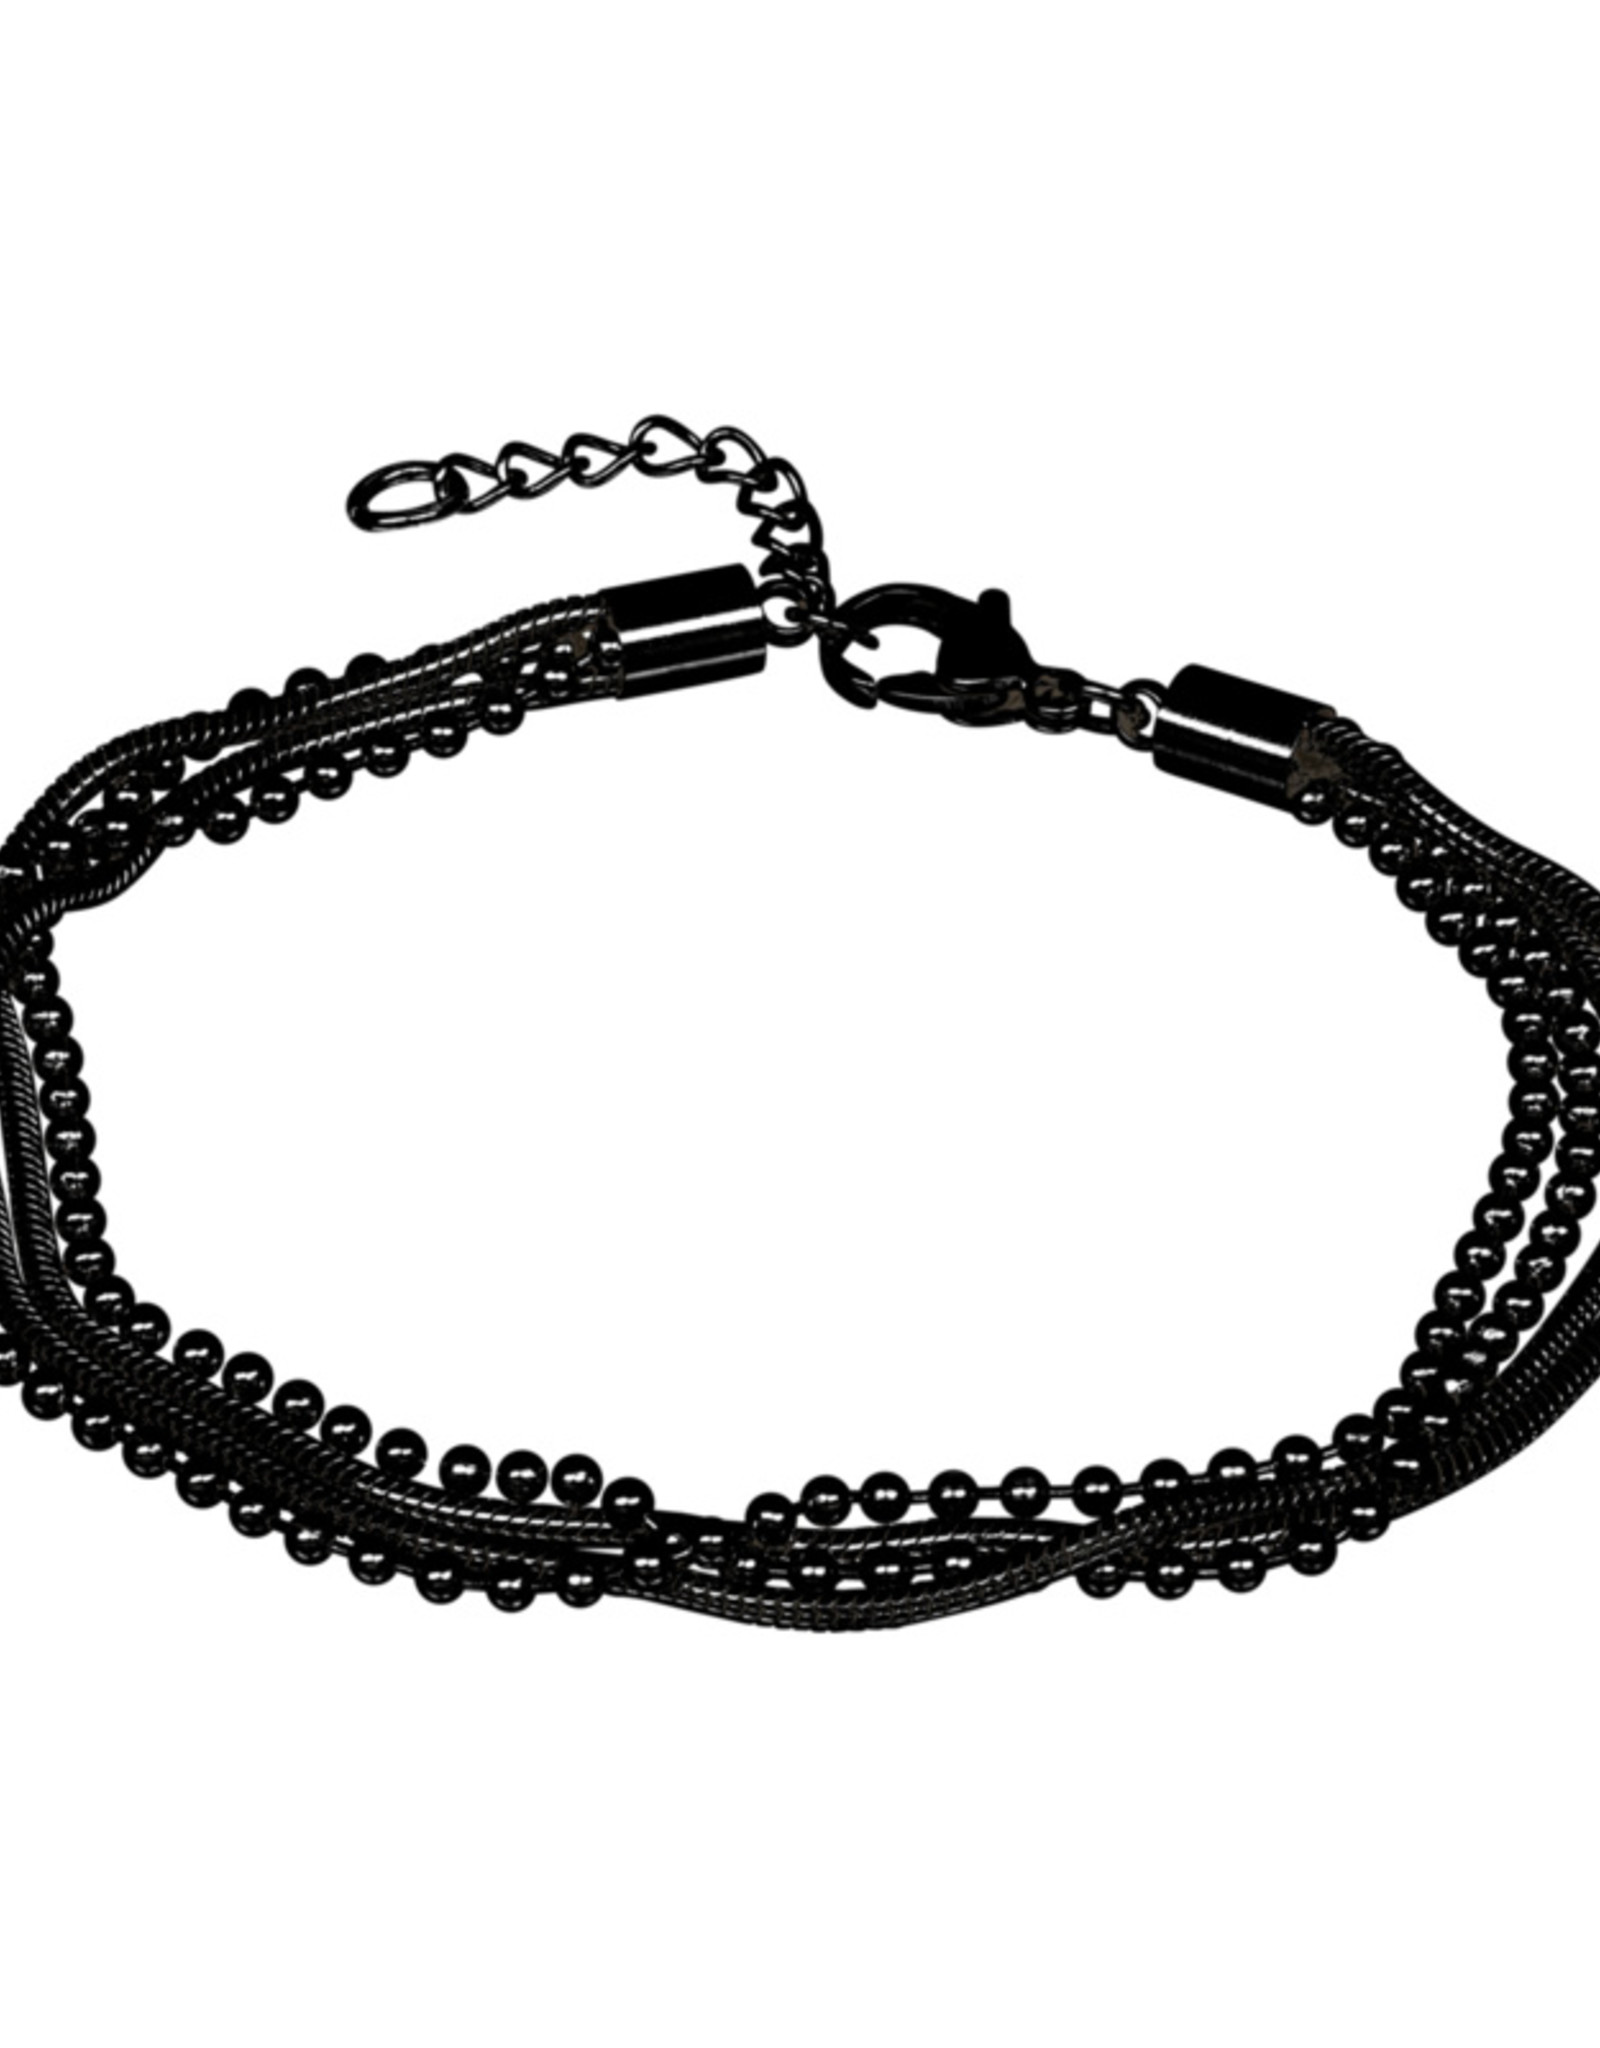 snake ball slim 4 pcs 23+4 black